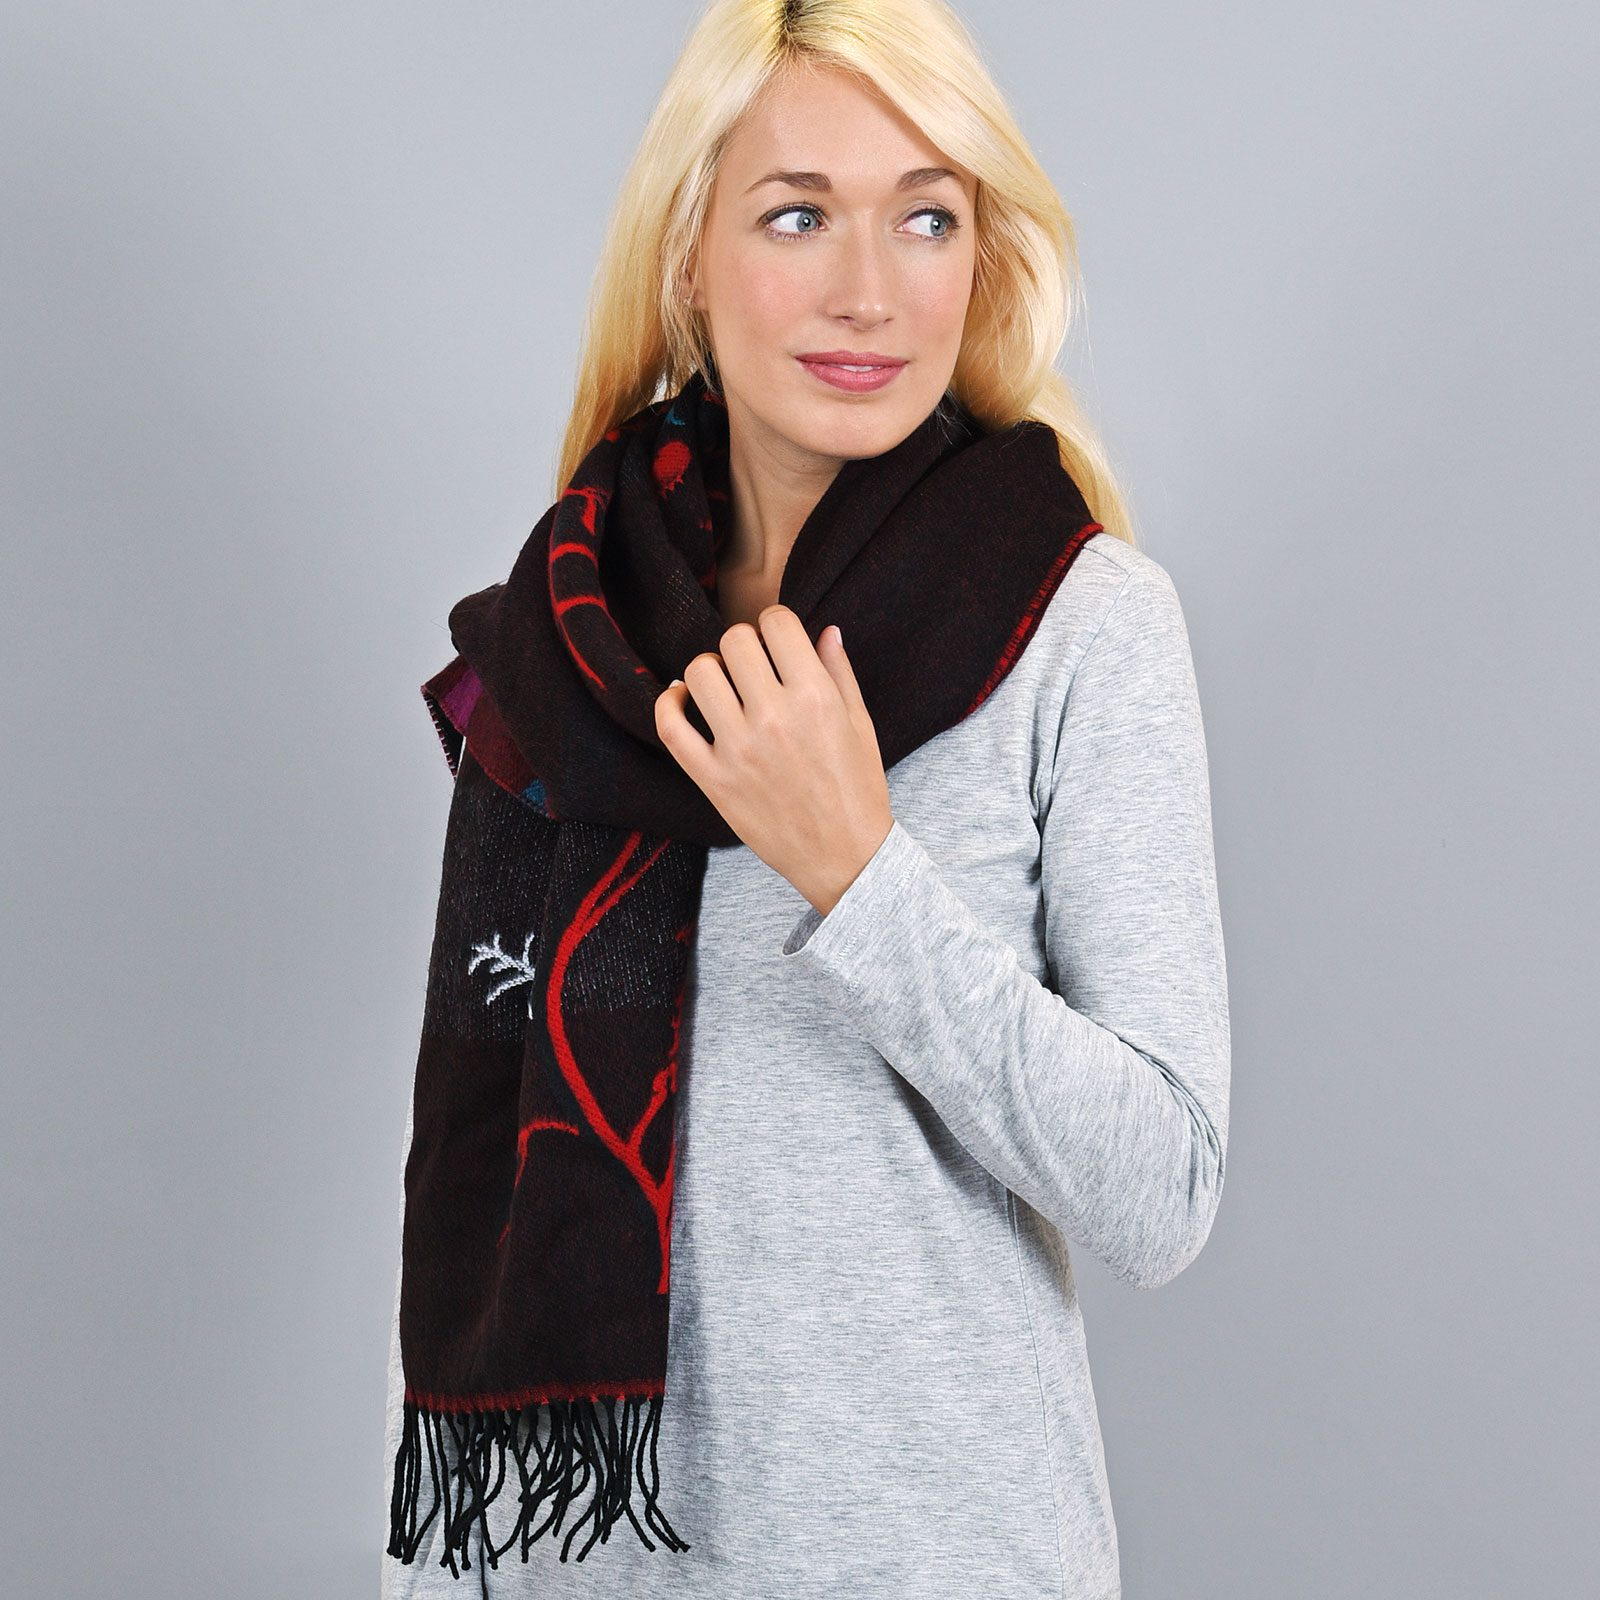 http://lookbook.allee-du-foulard.fr/wp-content/uploads/2018/11/AT-03441-VF16-1-chale-rouge-et-noir-cerisiers-1600x1600.jpg